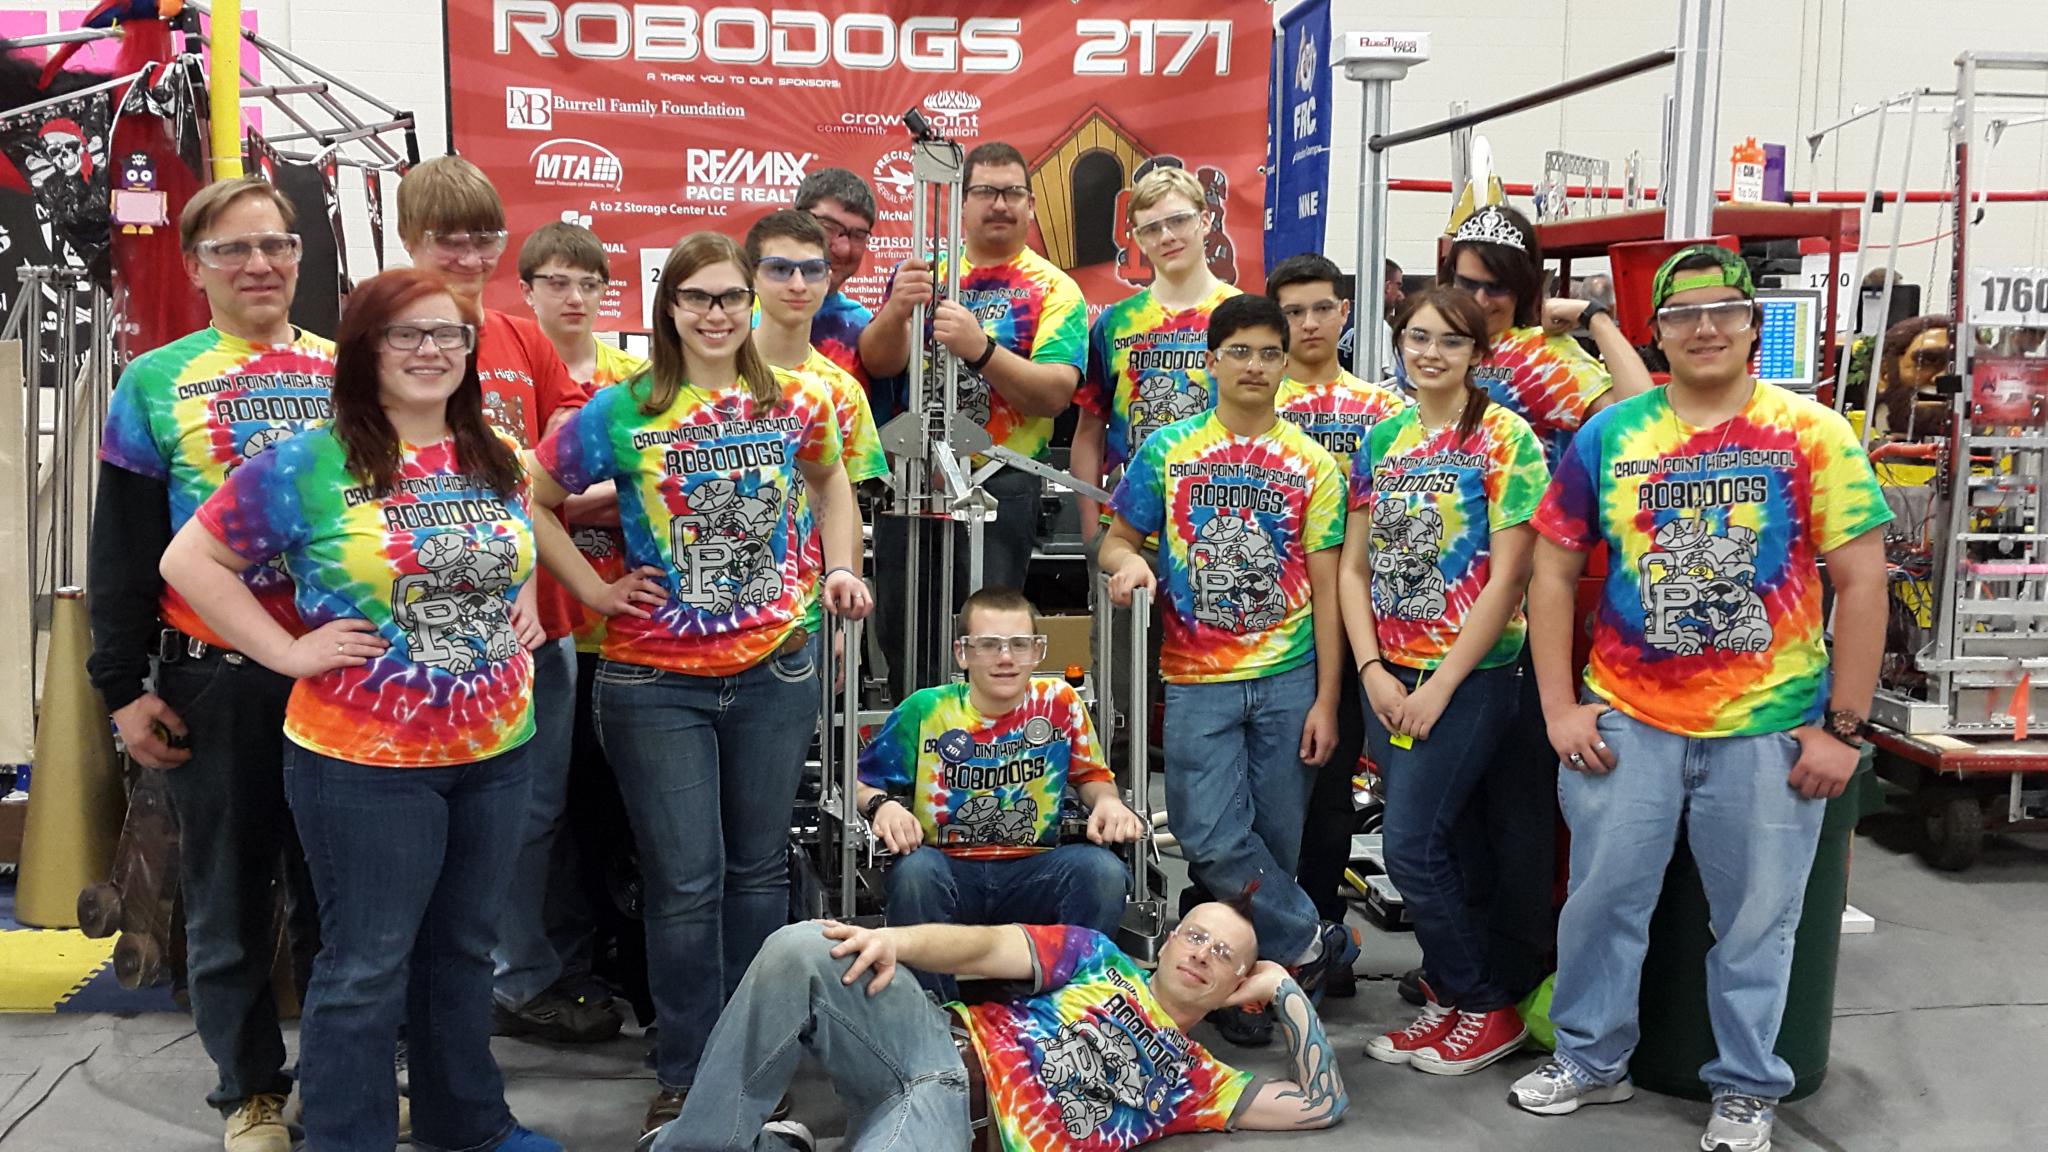 Shirt design louisville ky - Crown Point Robo Dogs Robotics Team 2171 T Shirt Photo